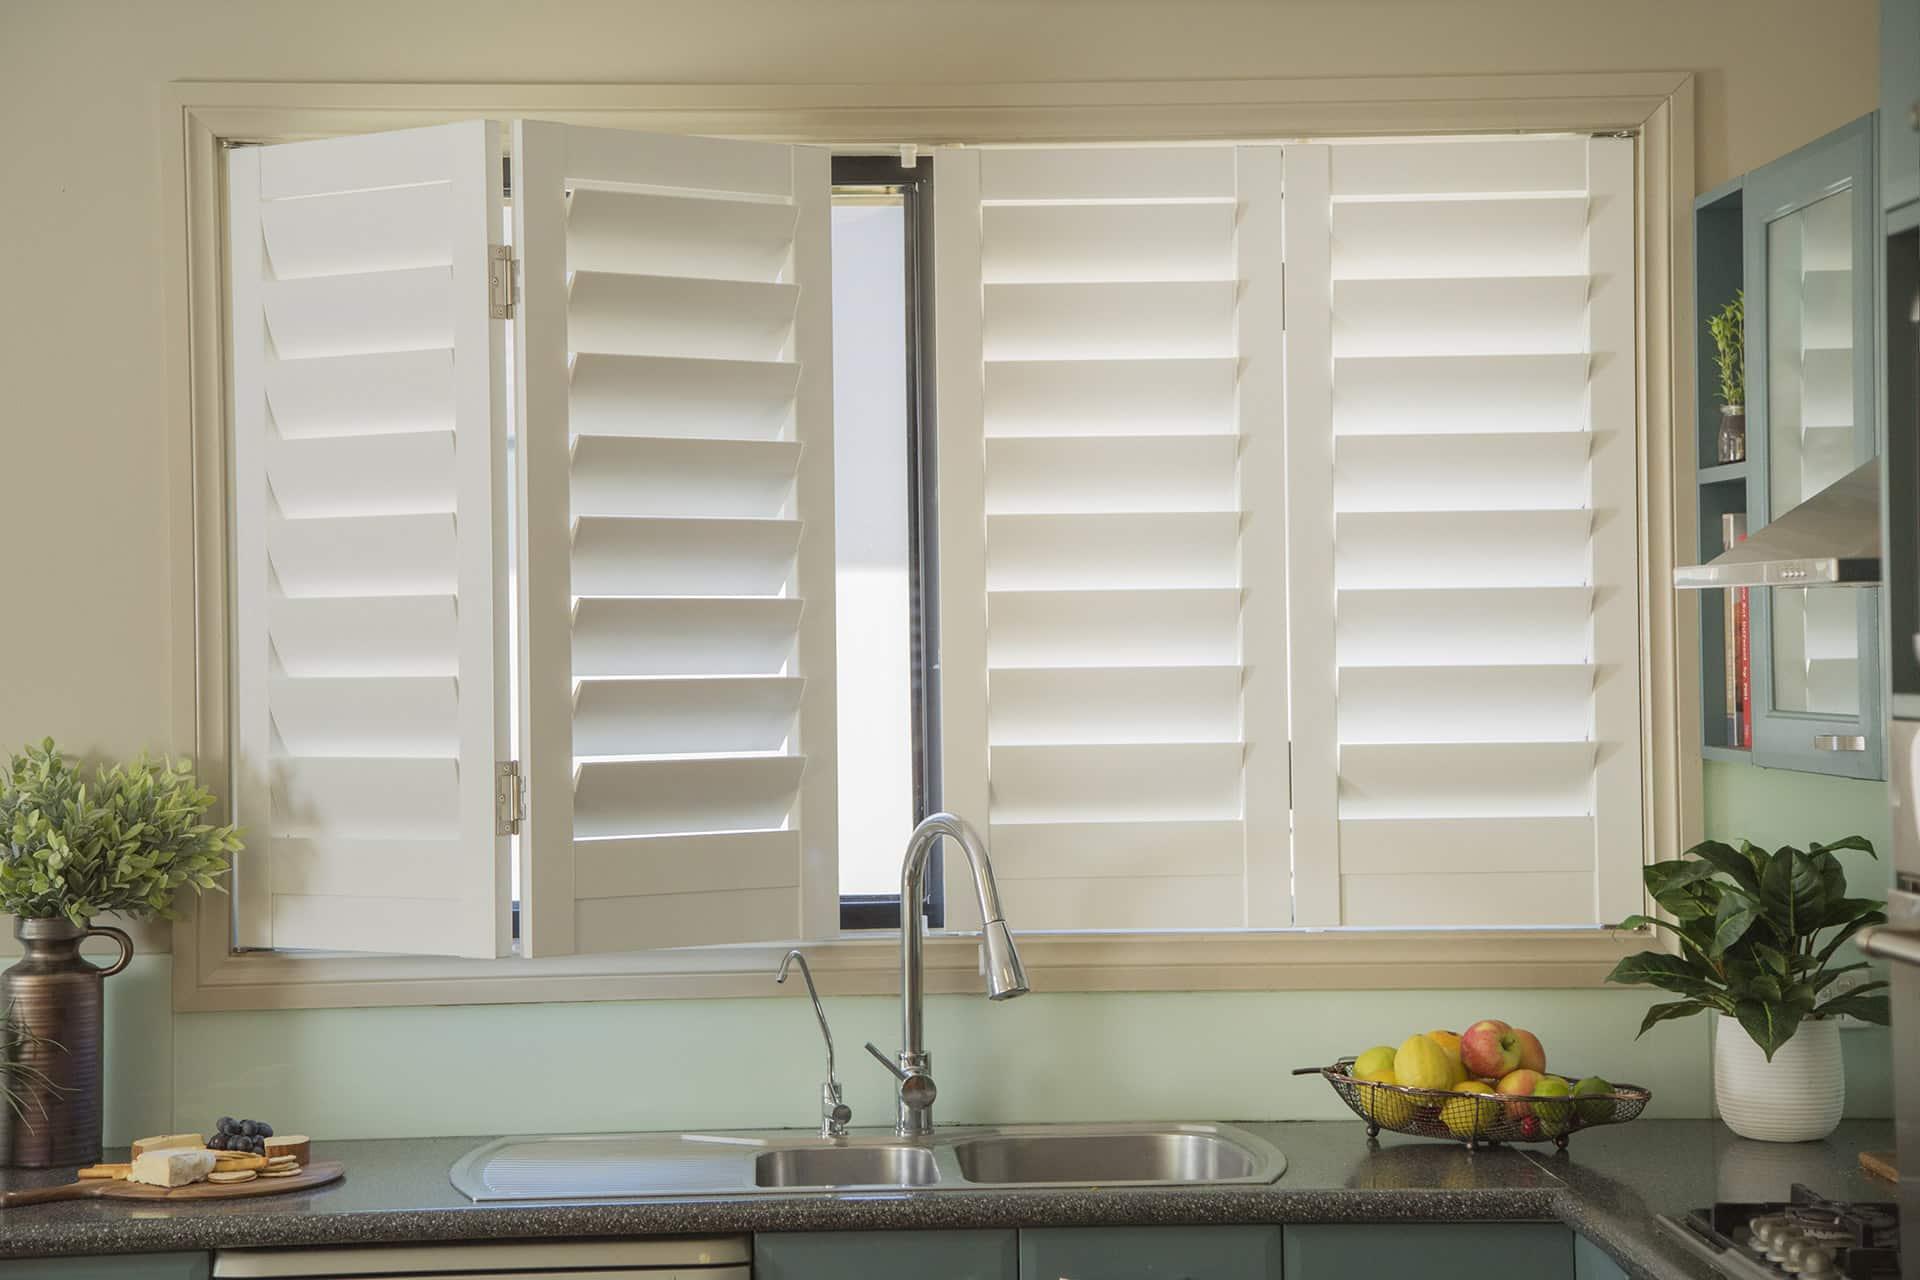 plantation shutters bi-fold-kitchen-plantation-shutters.jpg YYPIFRW